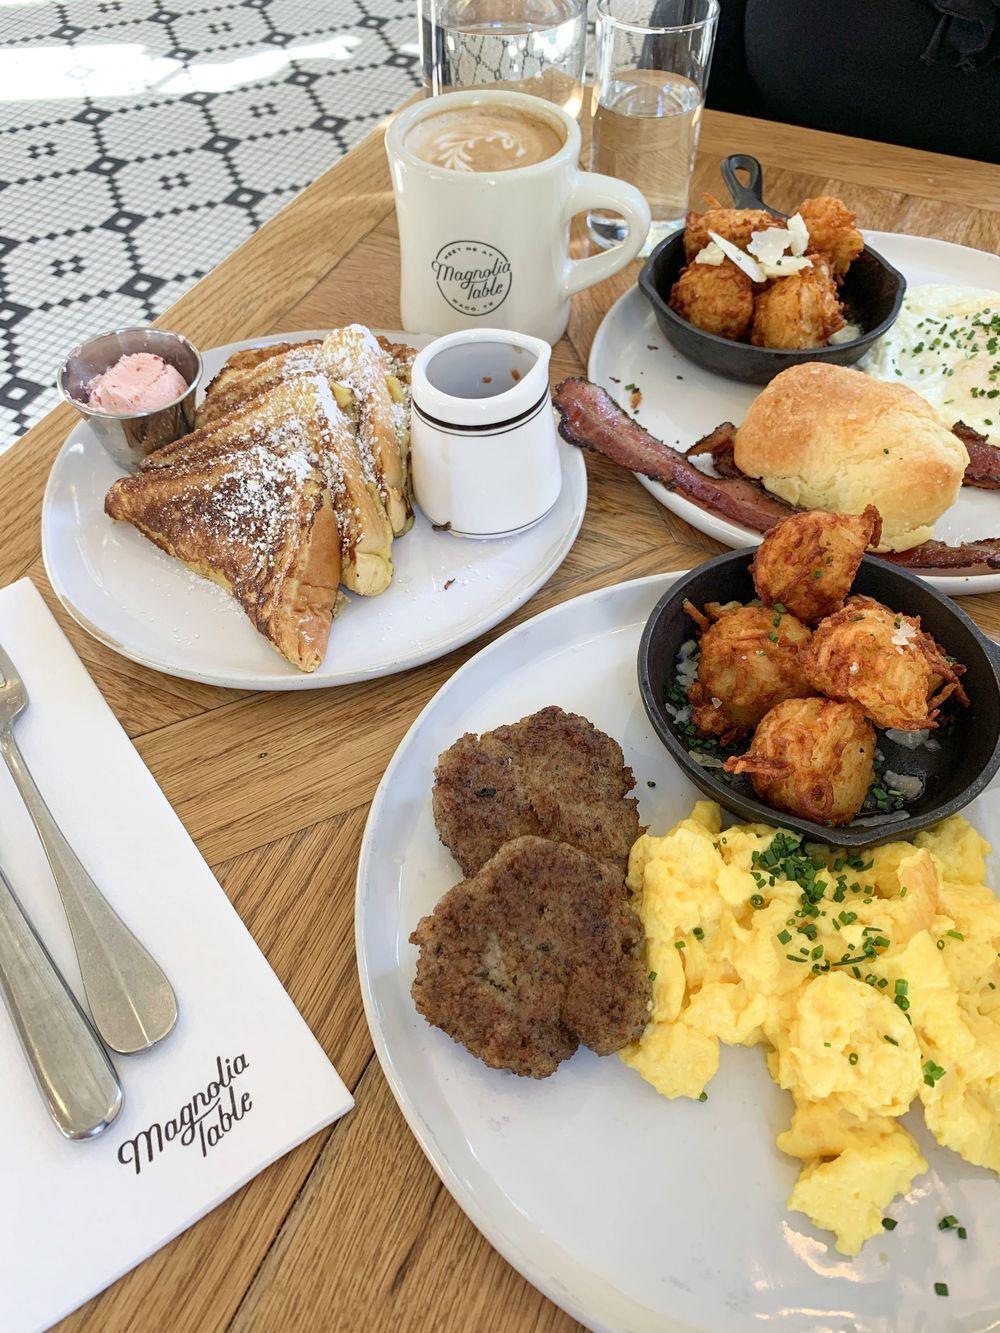 Magnolia Table American Breakfast in Waco